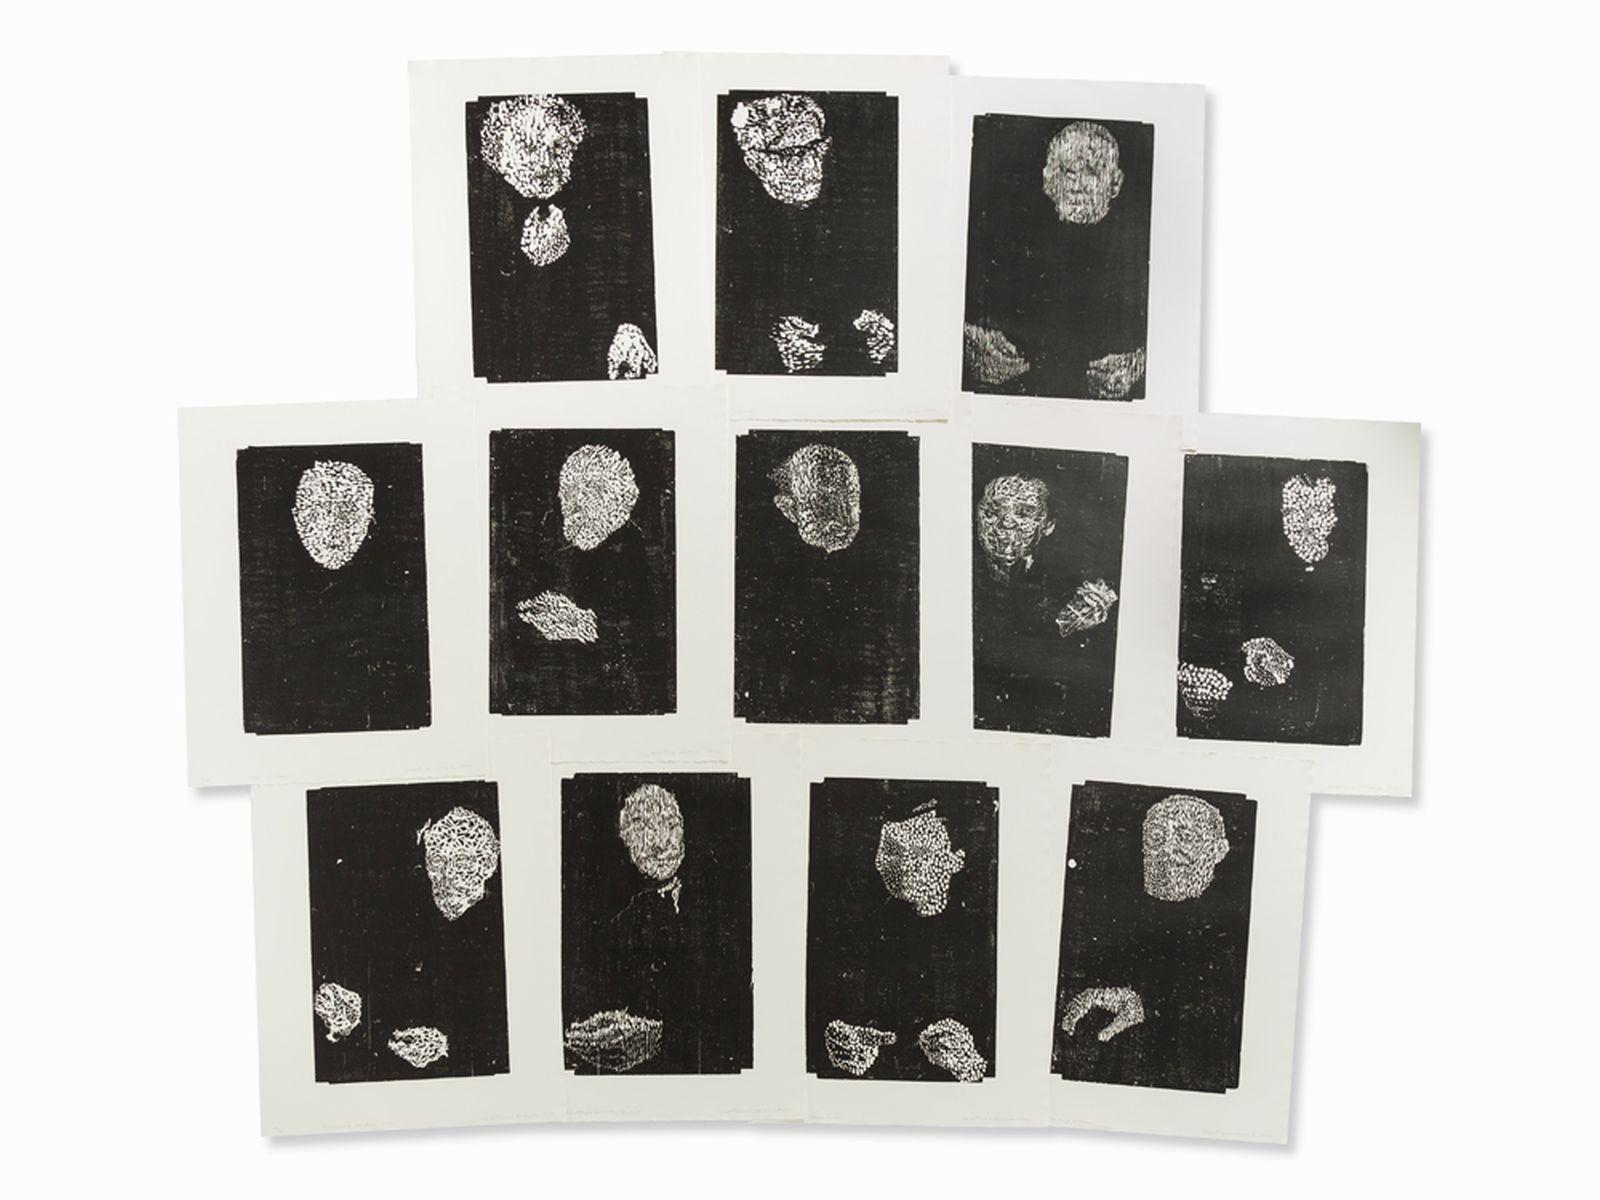 "#55 Matthias Mansen, Symposion (Köpfe), 12 Woodcuts, 1999 | Matthias Mansen (geb. 1958) , Symposion (""Hahnemühle Alt Worms"" ), 12 Holzschnitte, 1999 Image"